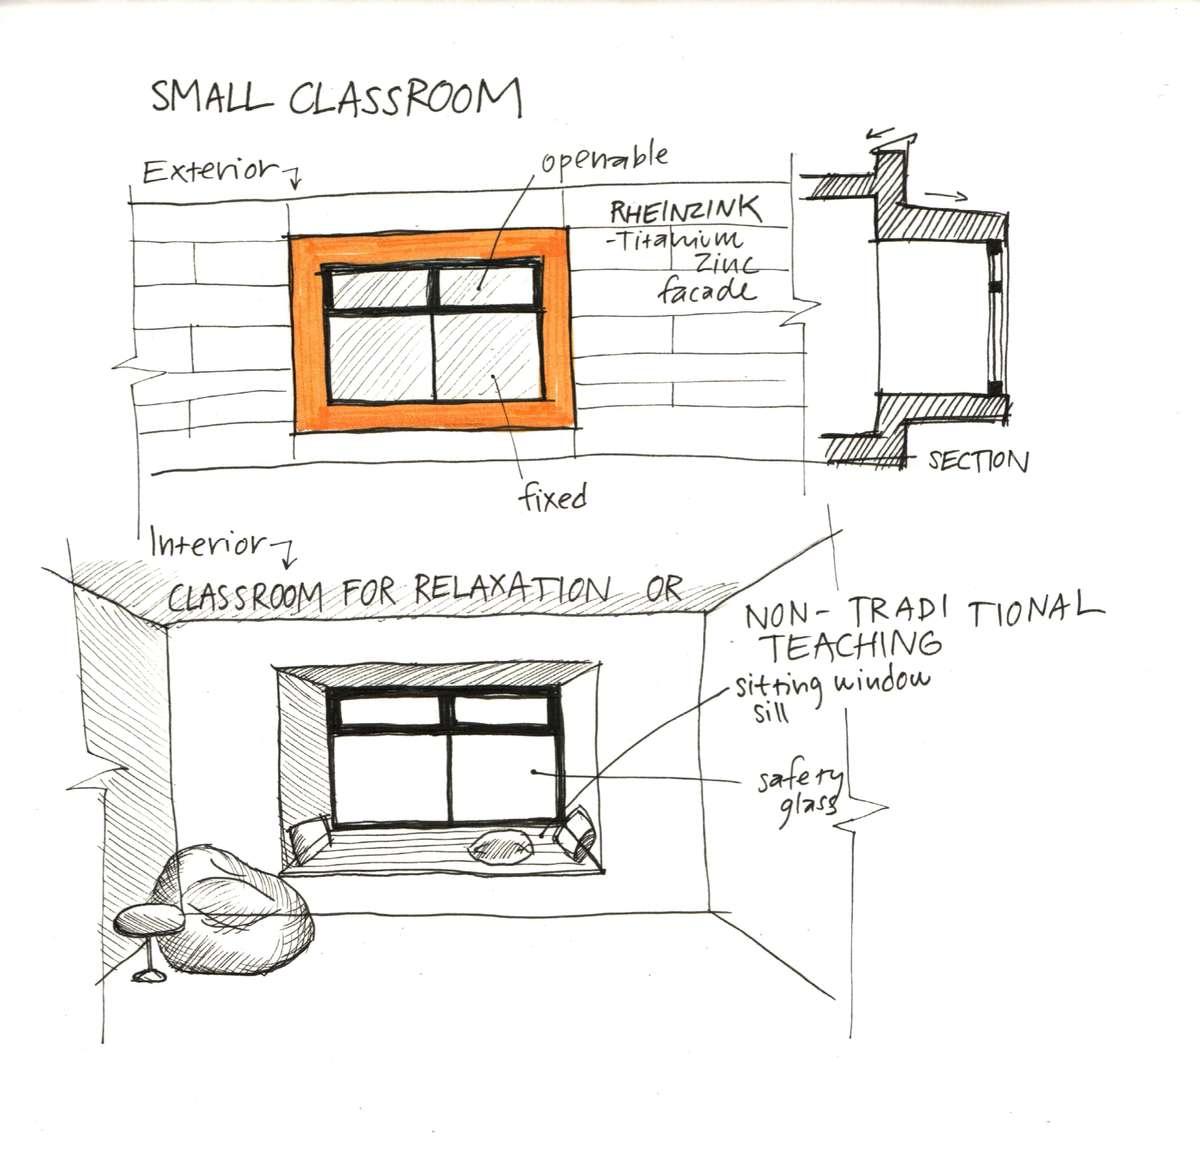 Small classroom sketch